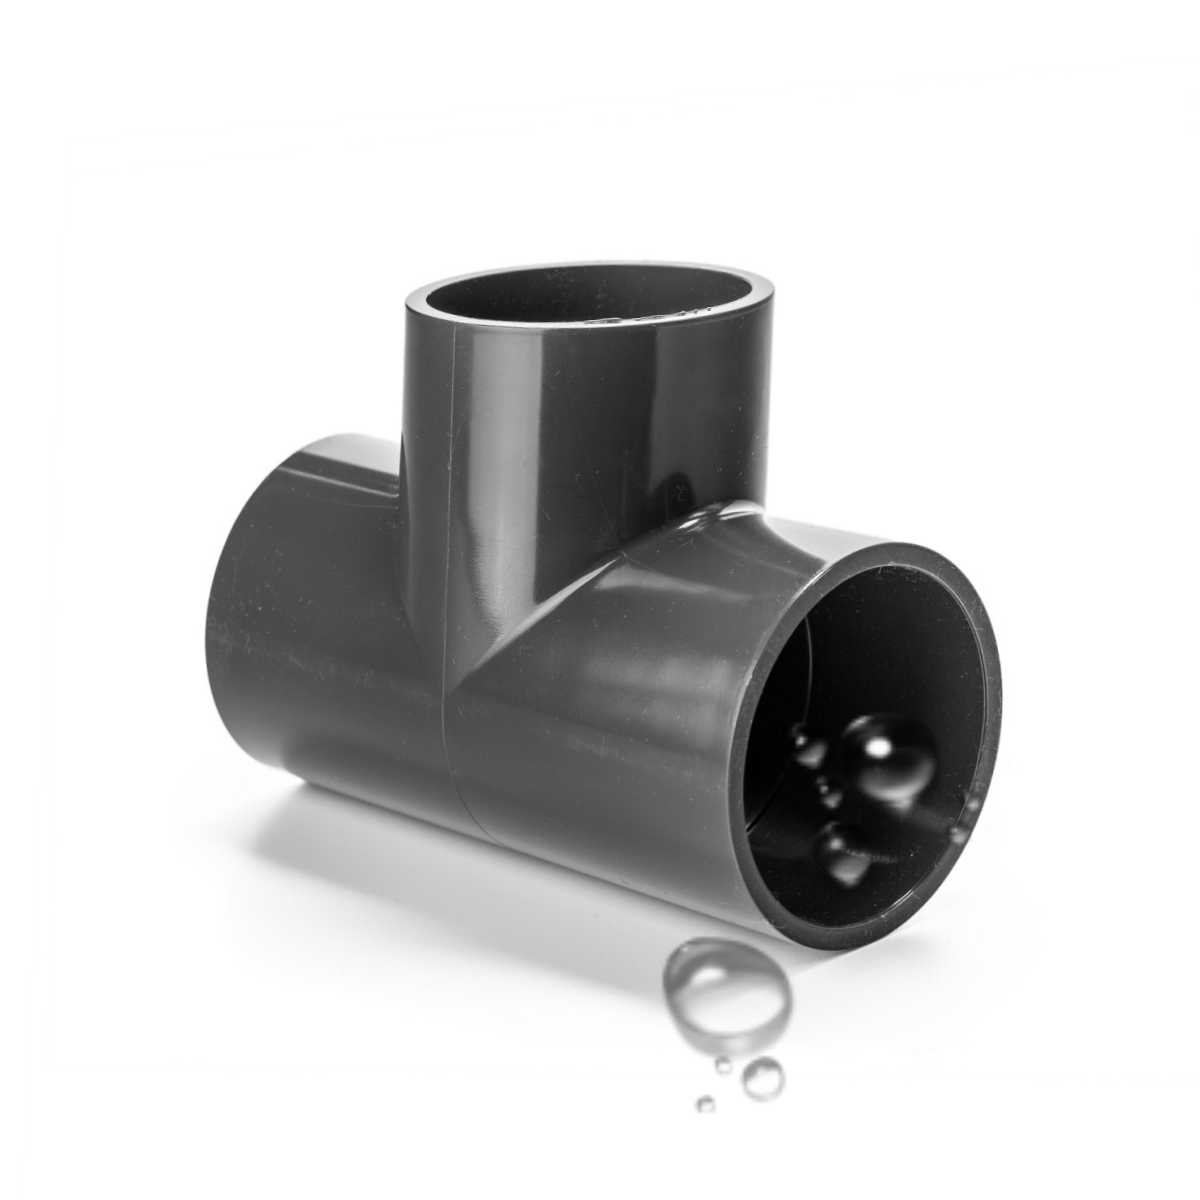 Тройник ПВХ Aquaviva  диаметр110 мм